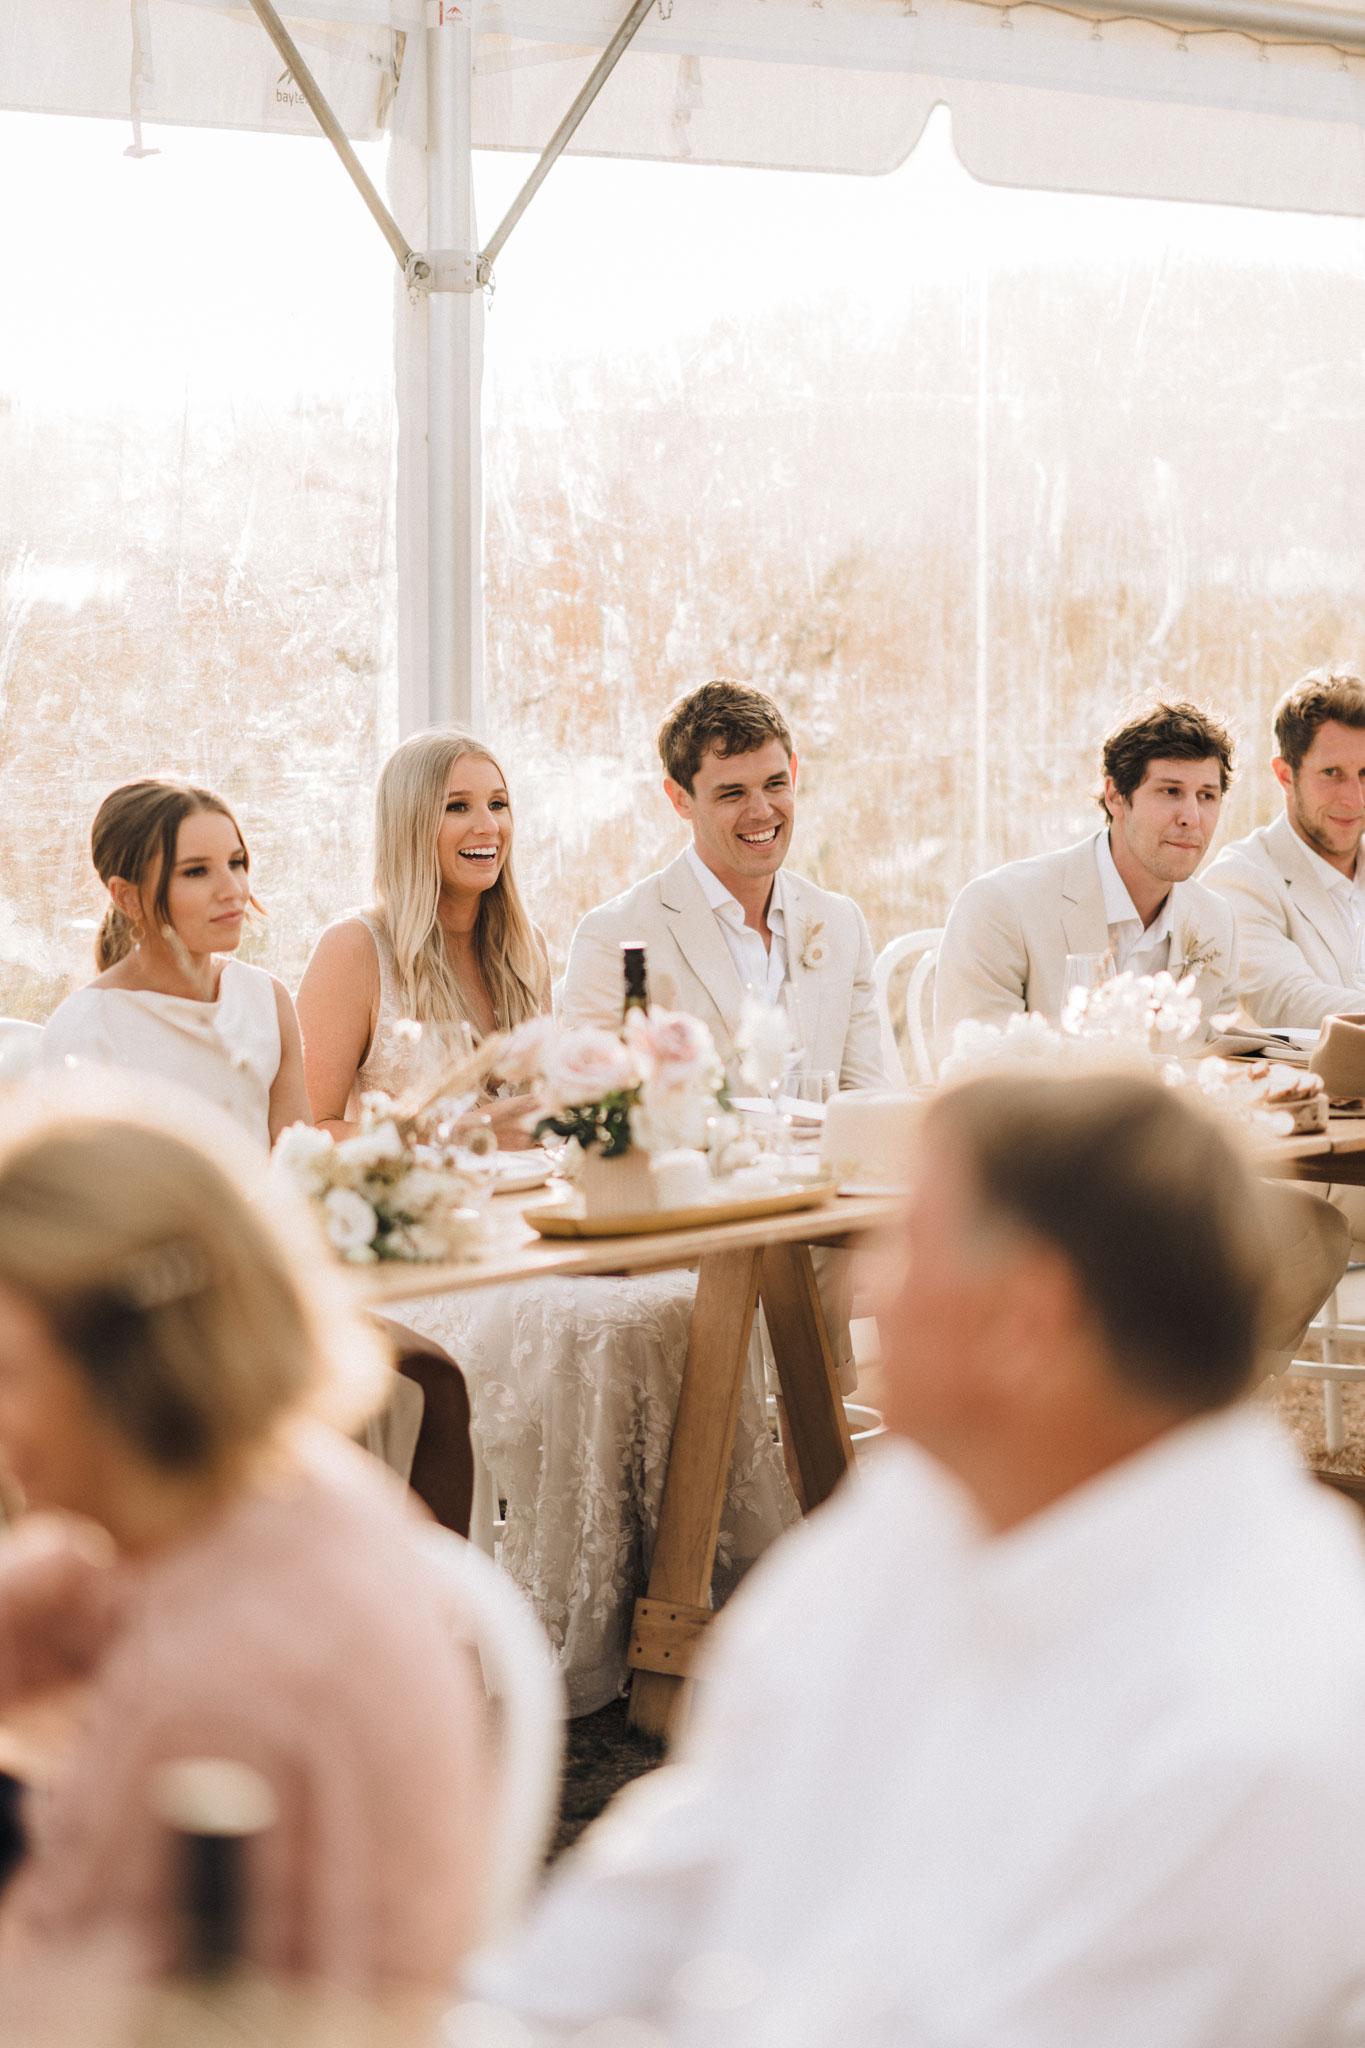 newfound-k-b-coromandel-wedding-photographers-108